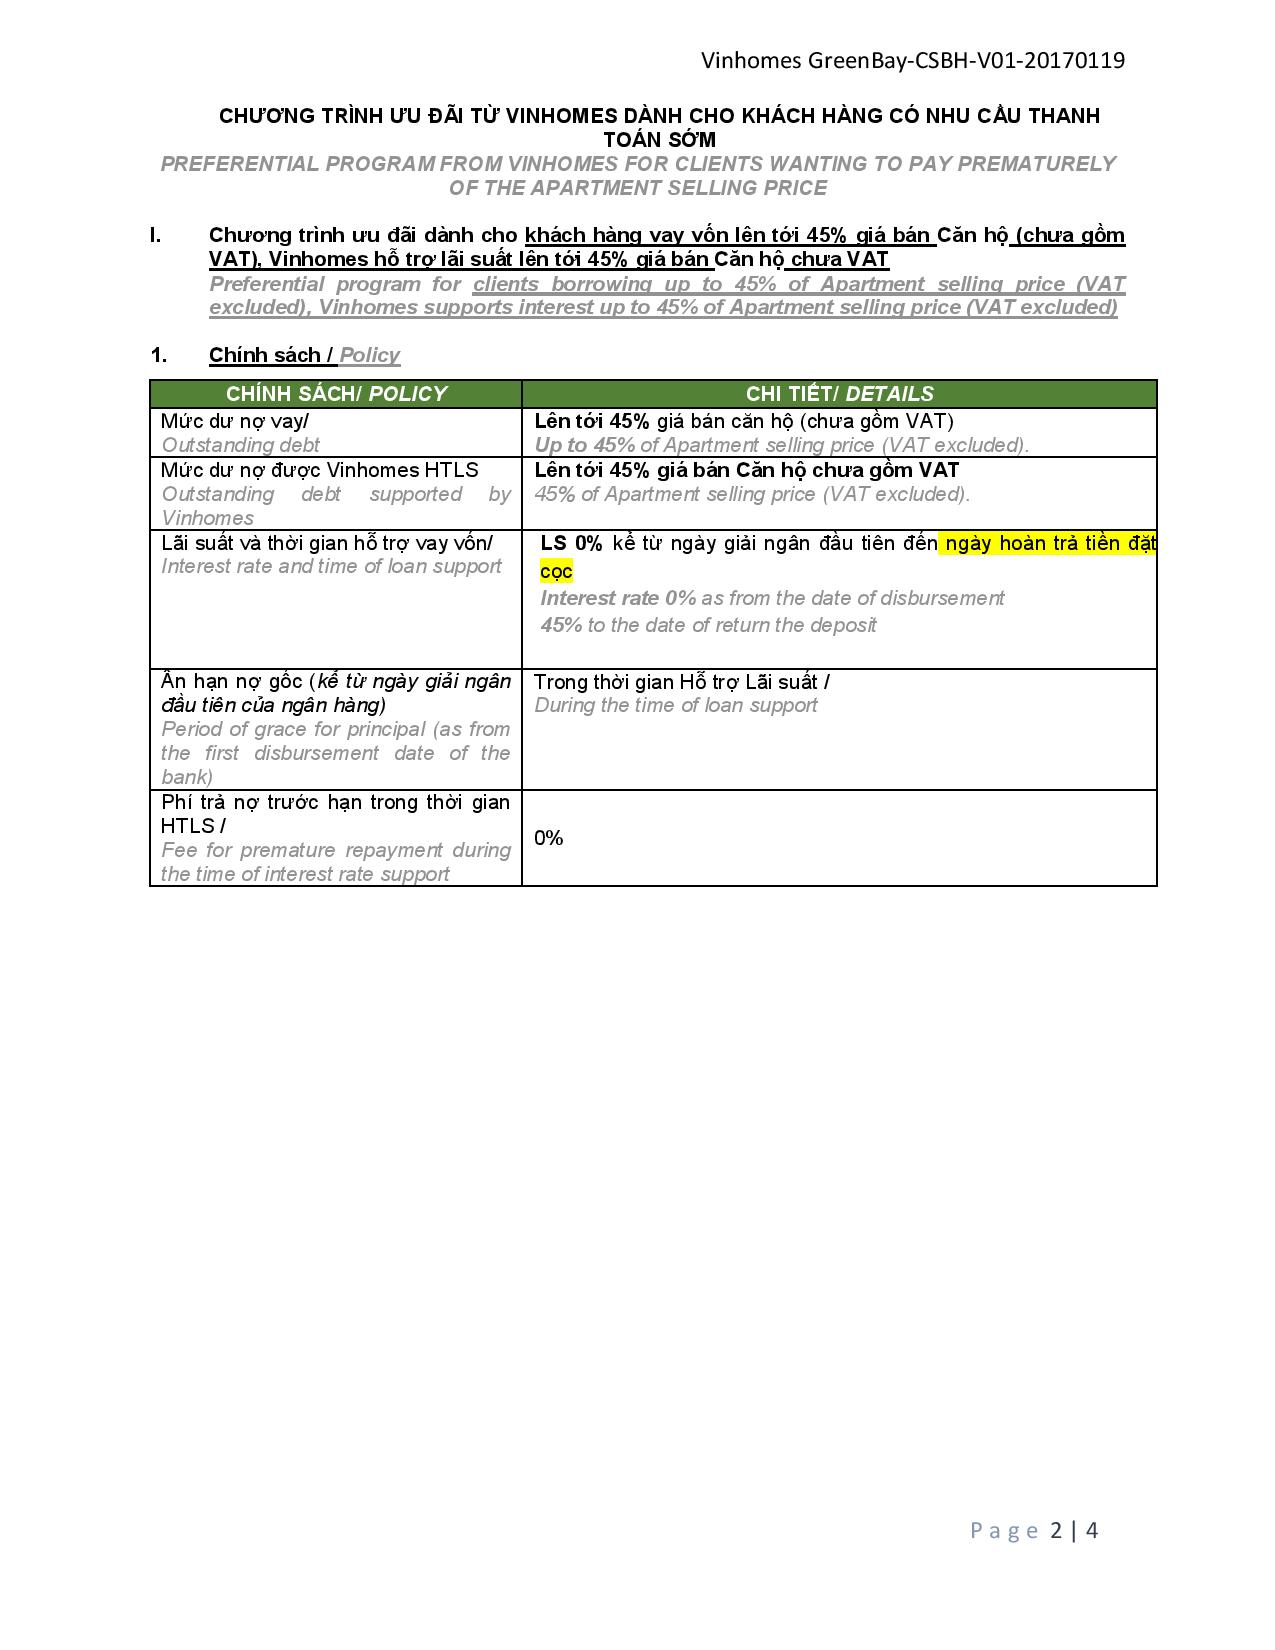 170116-GreenBay-Canho-CS dat coc_final-page-002